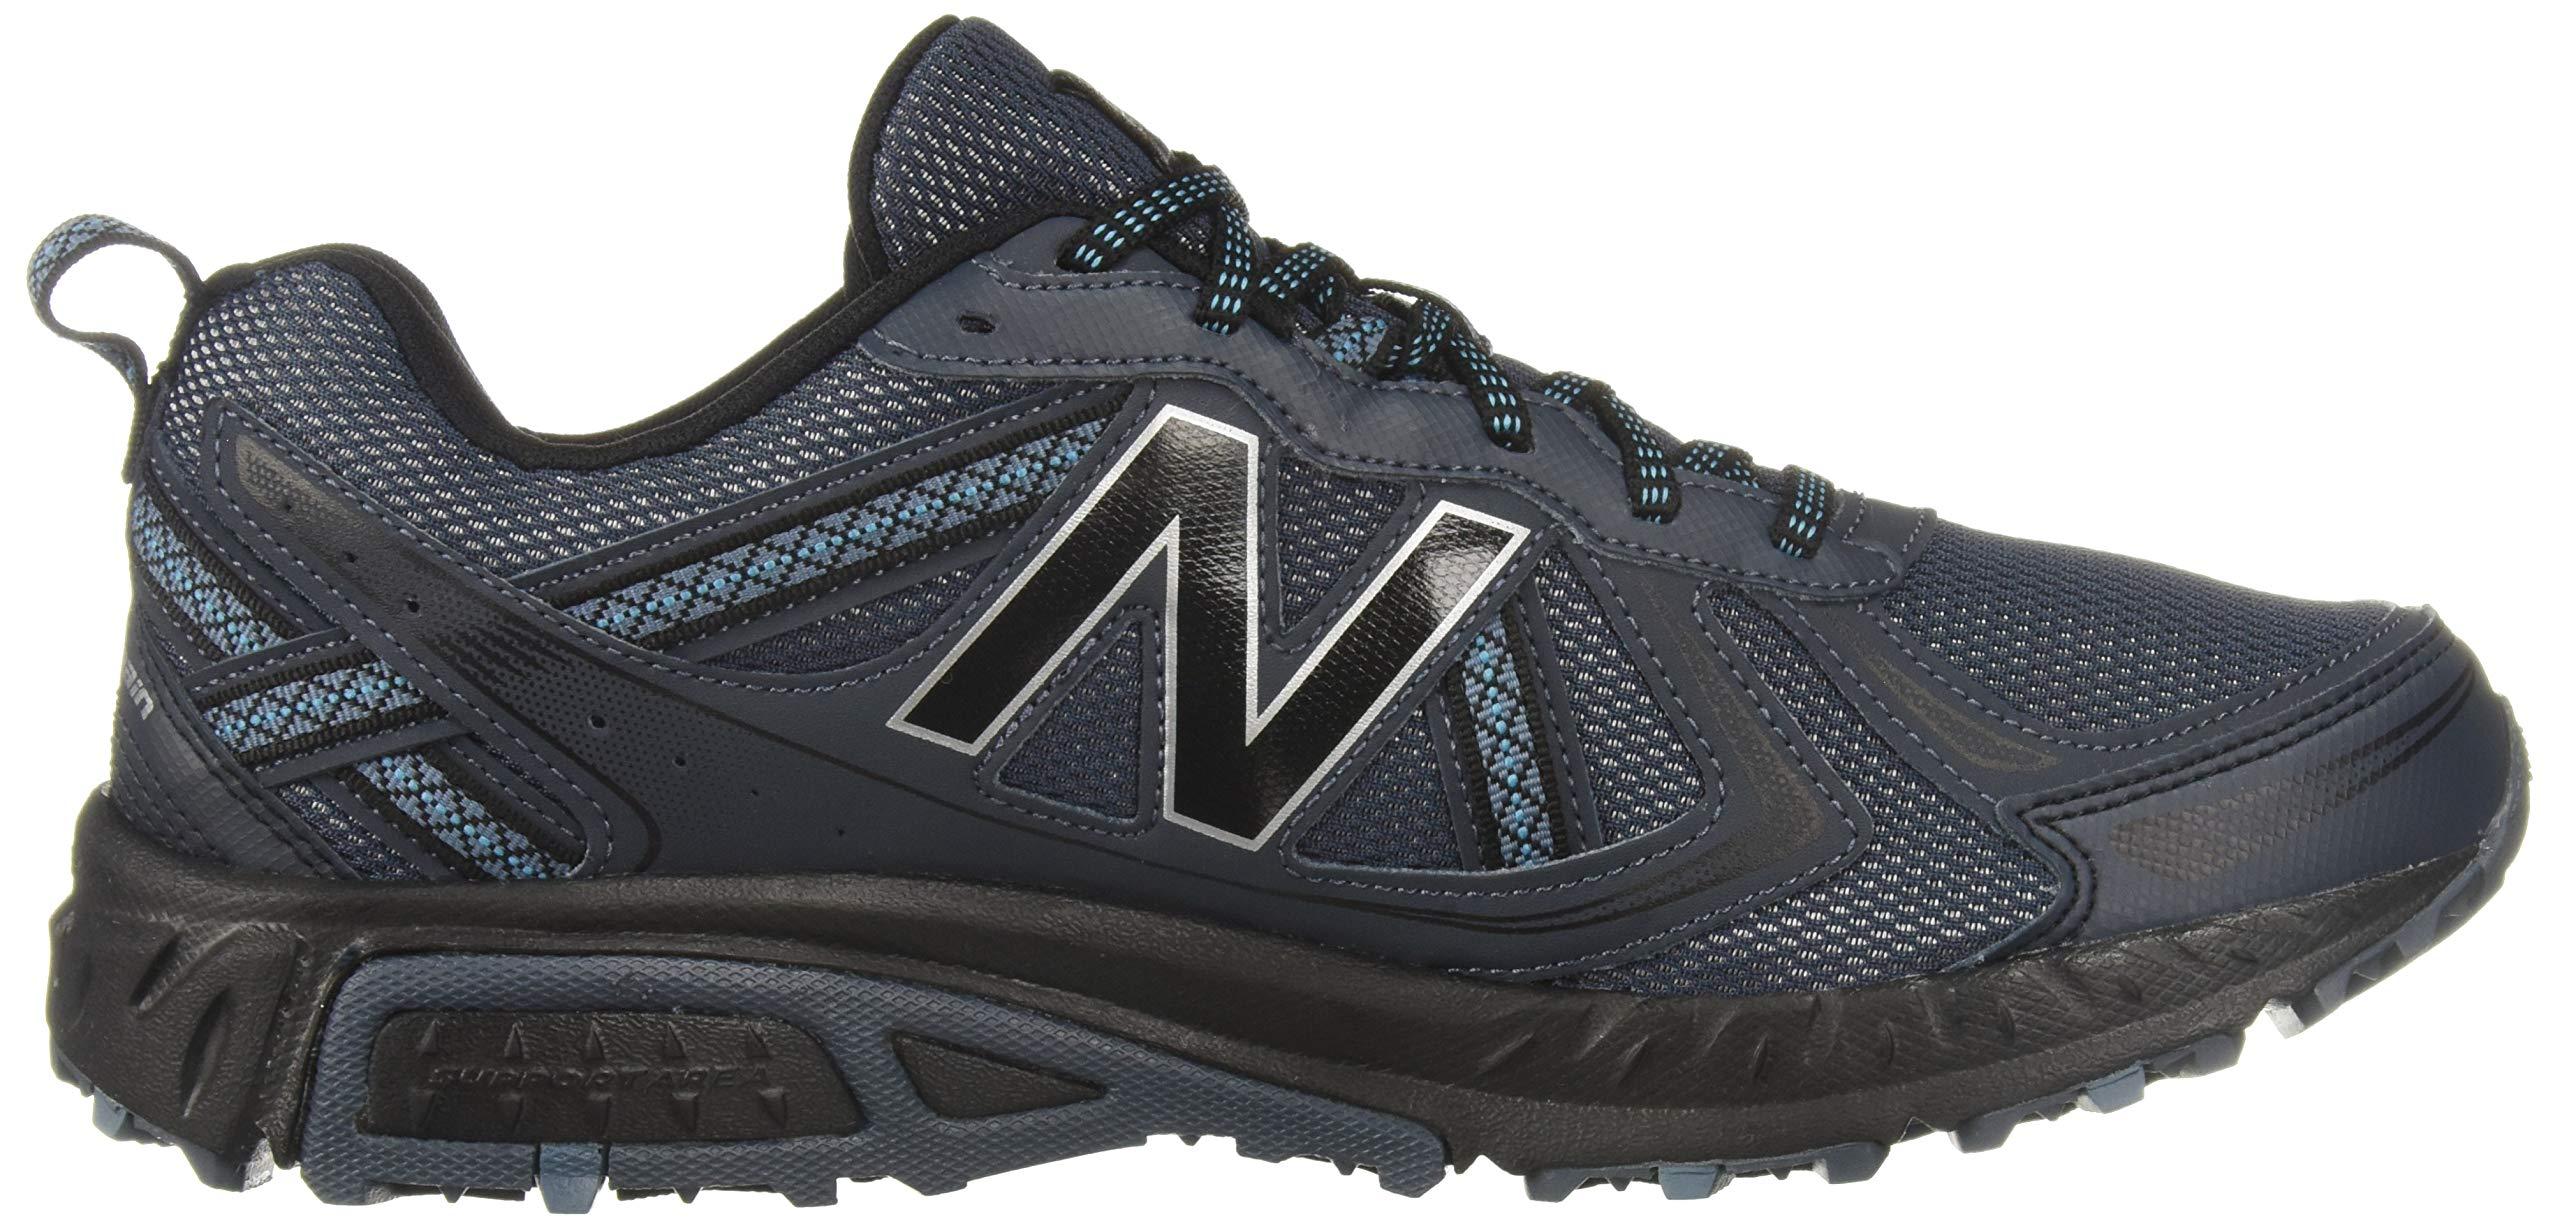 New Balance Men's 410v5 Cushioning Trail Running Shoe, Petrol/Cadet/Black, 7 D US by New Balance (Image #7)